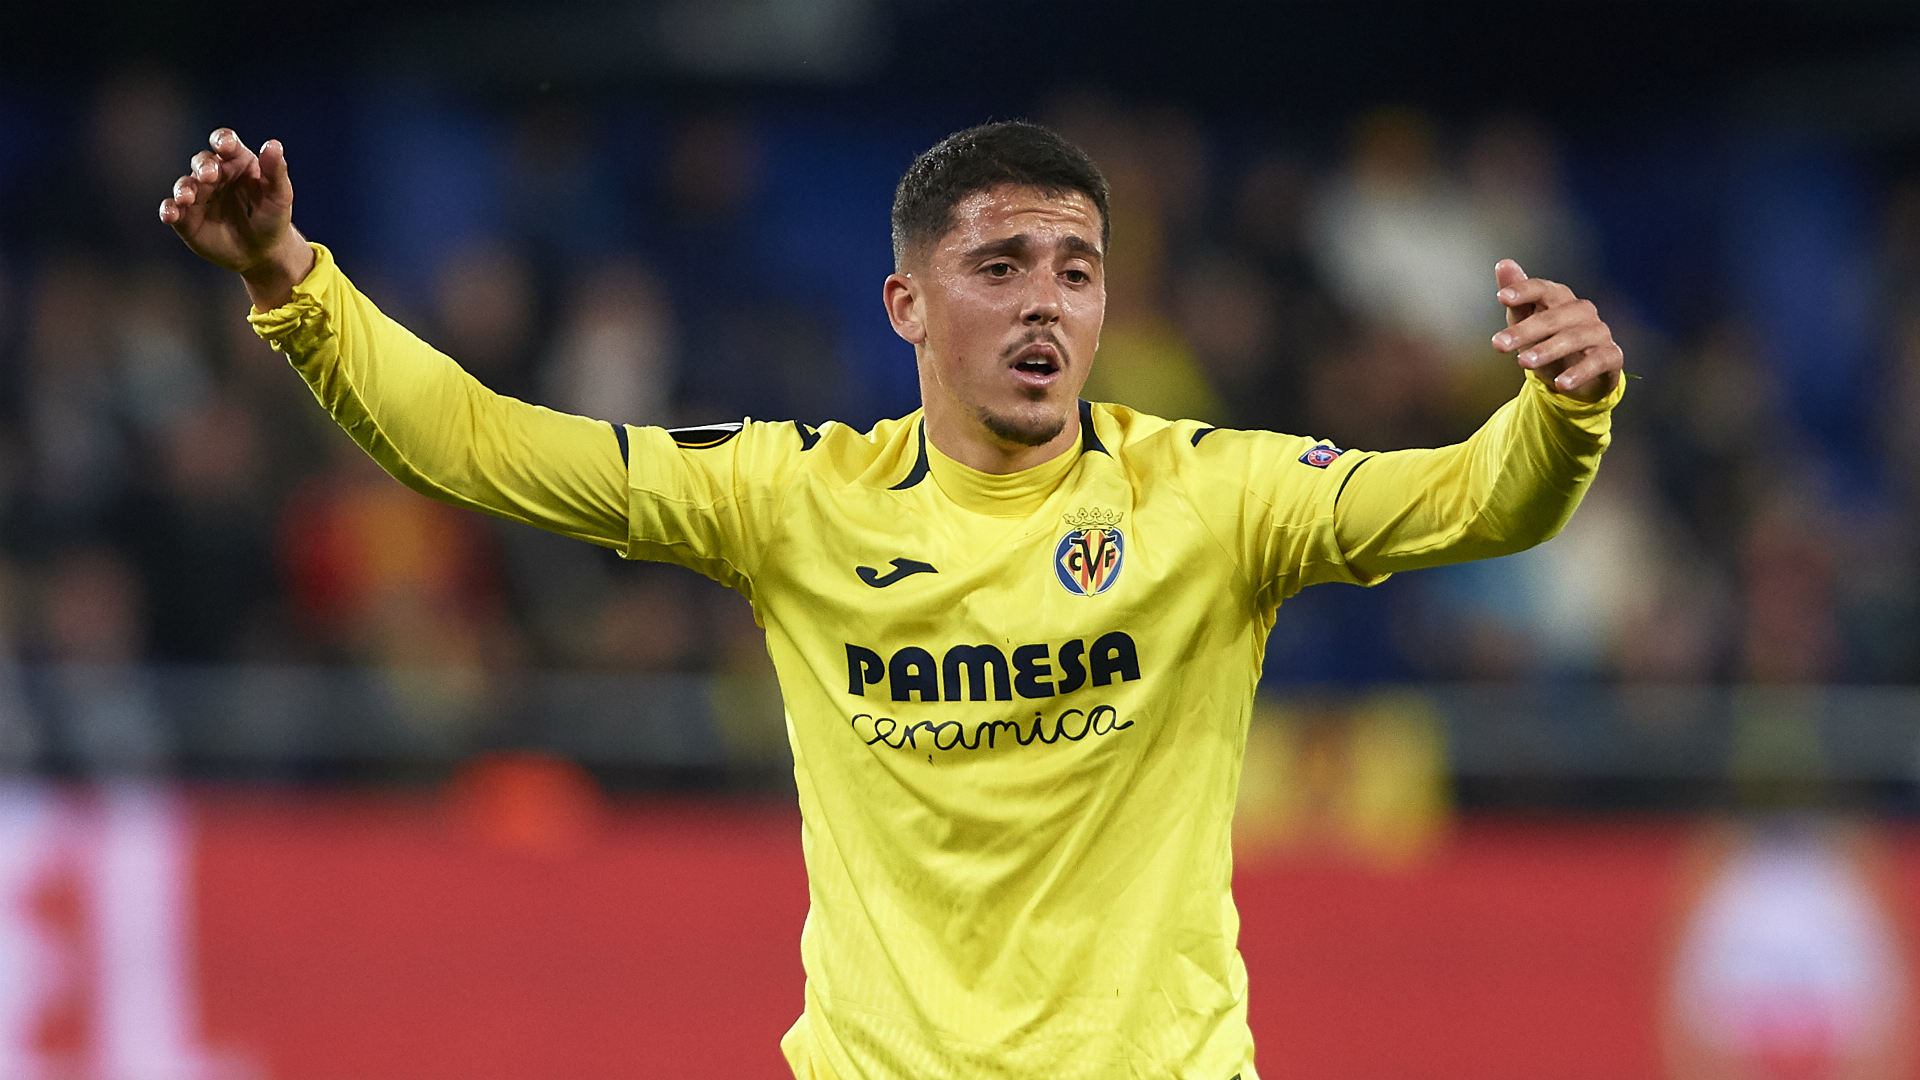 West Ham sign Spain midfielder Fornals from Villarreal